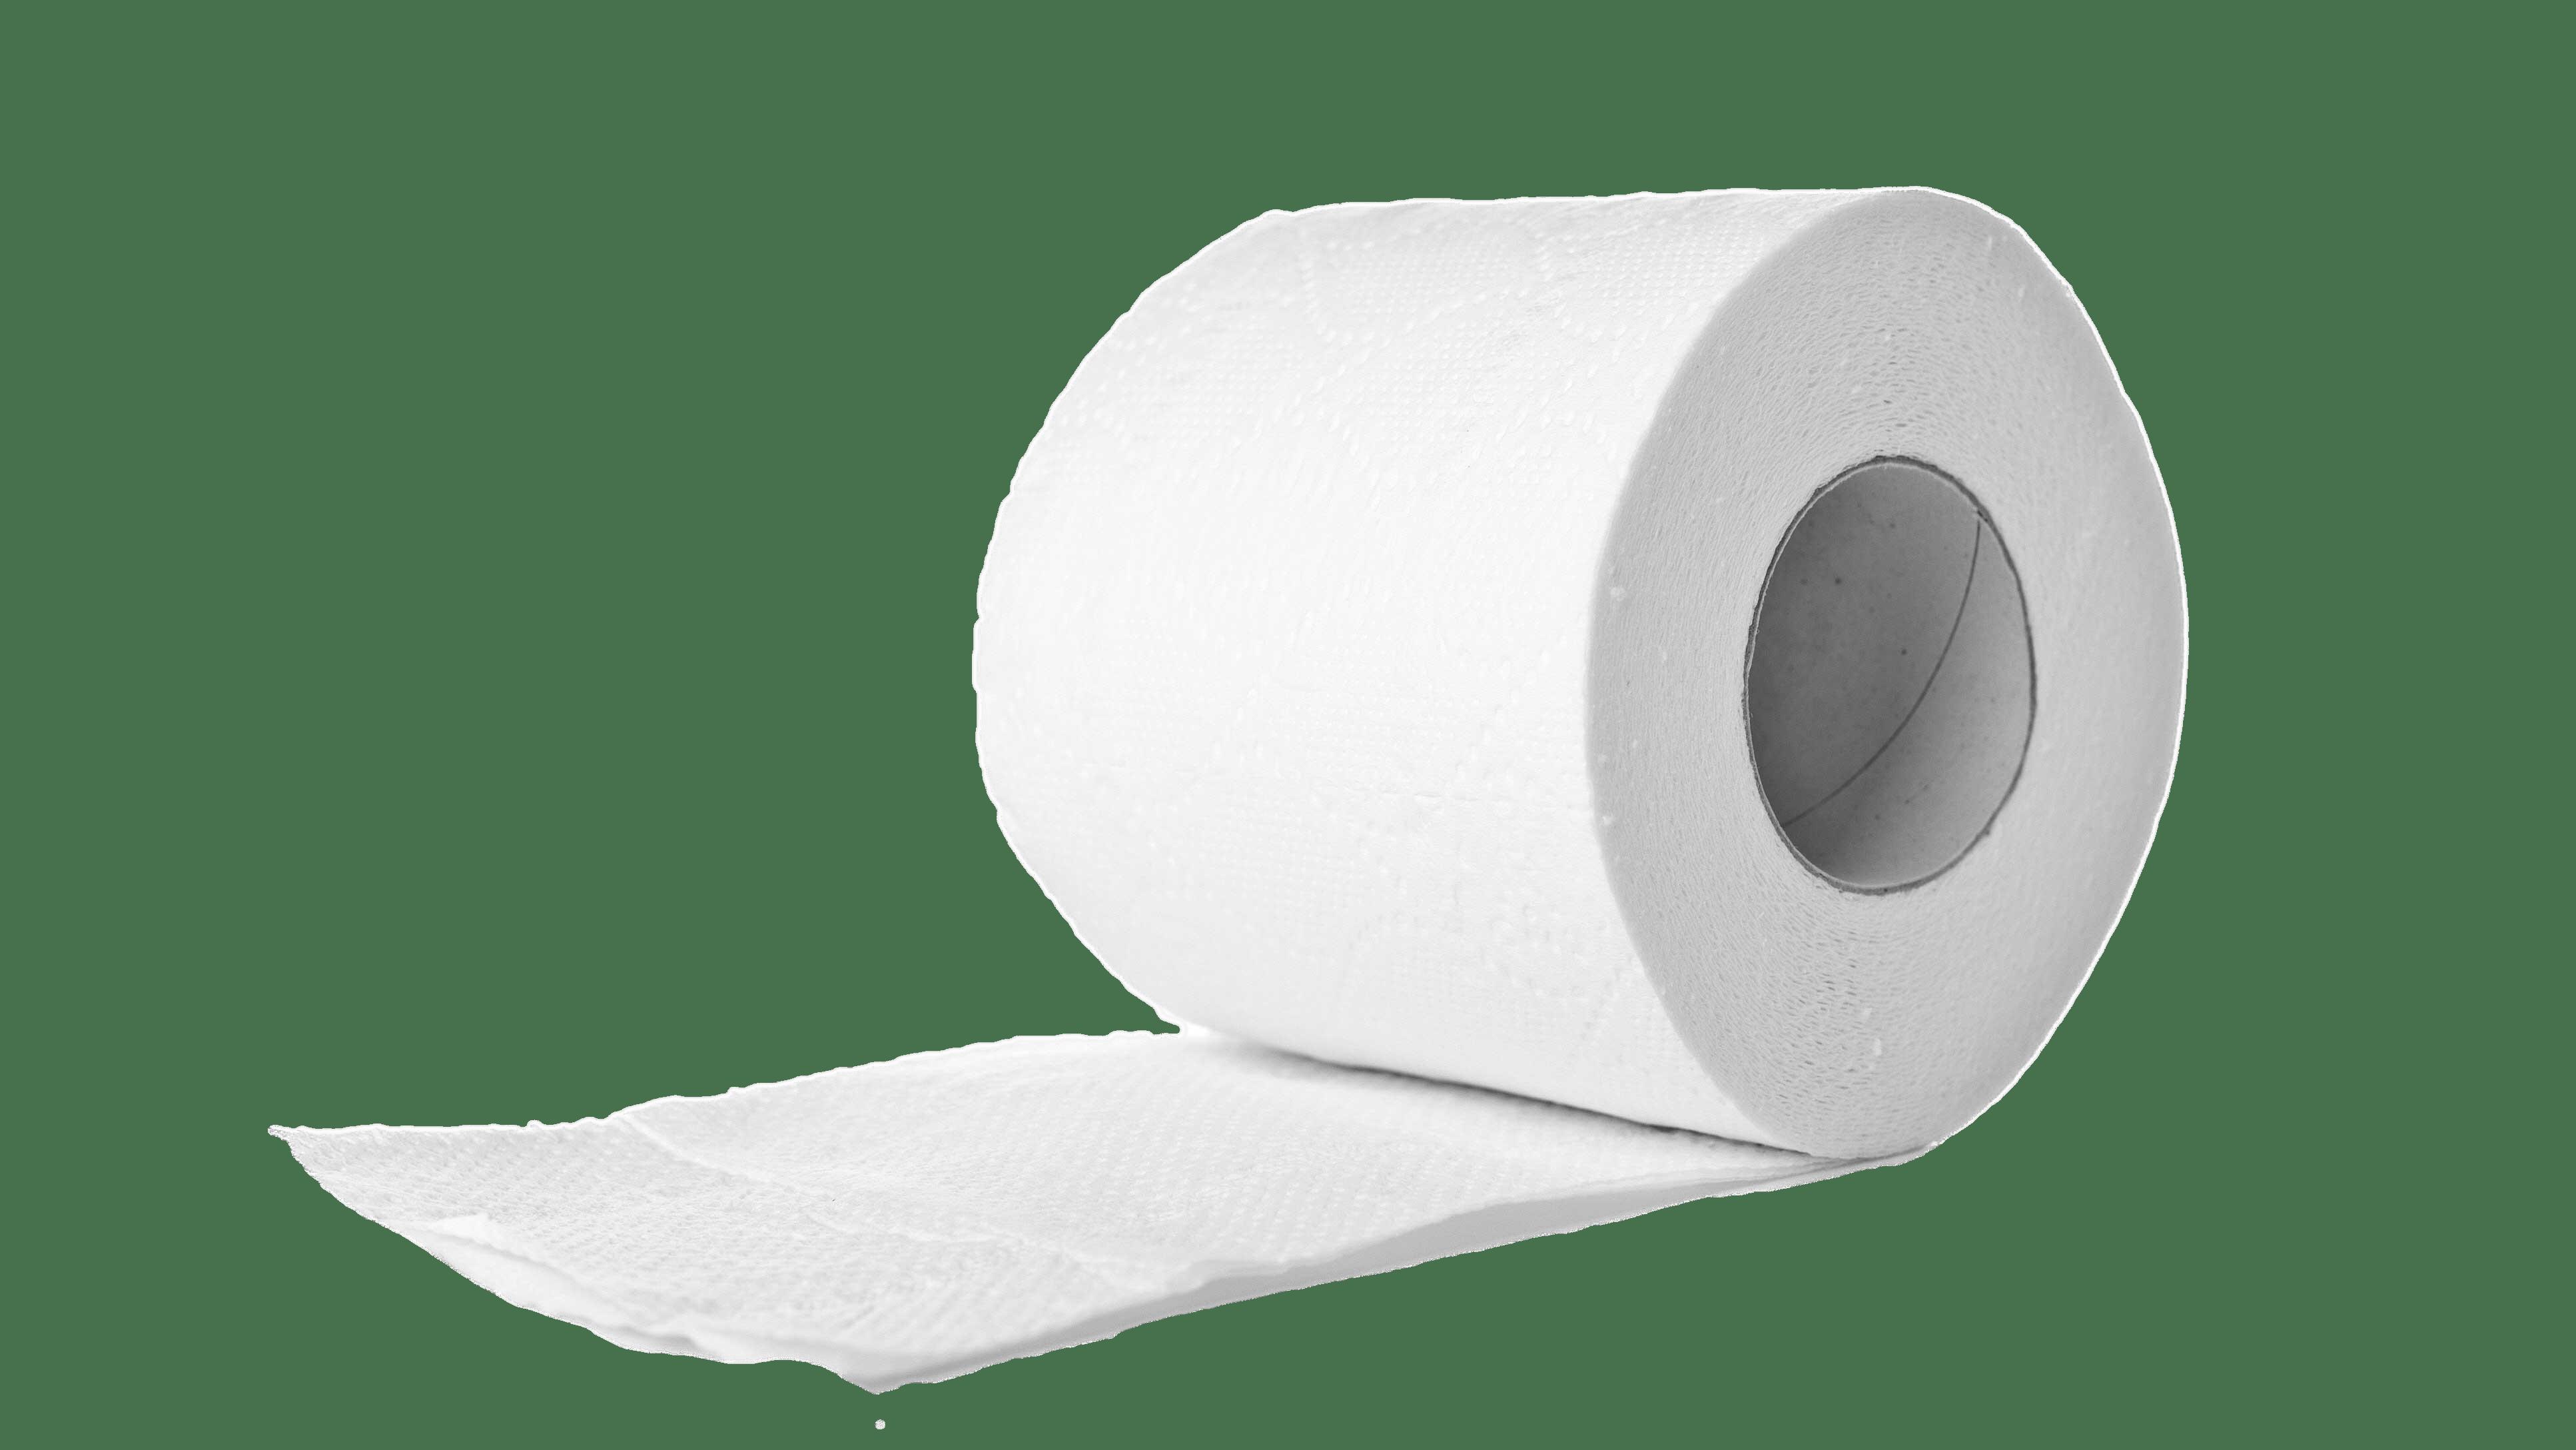 Clipart toilet toilet paper. Roll transparent png stickpng